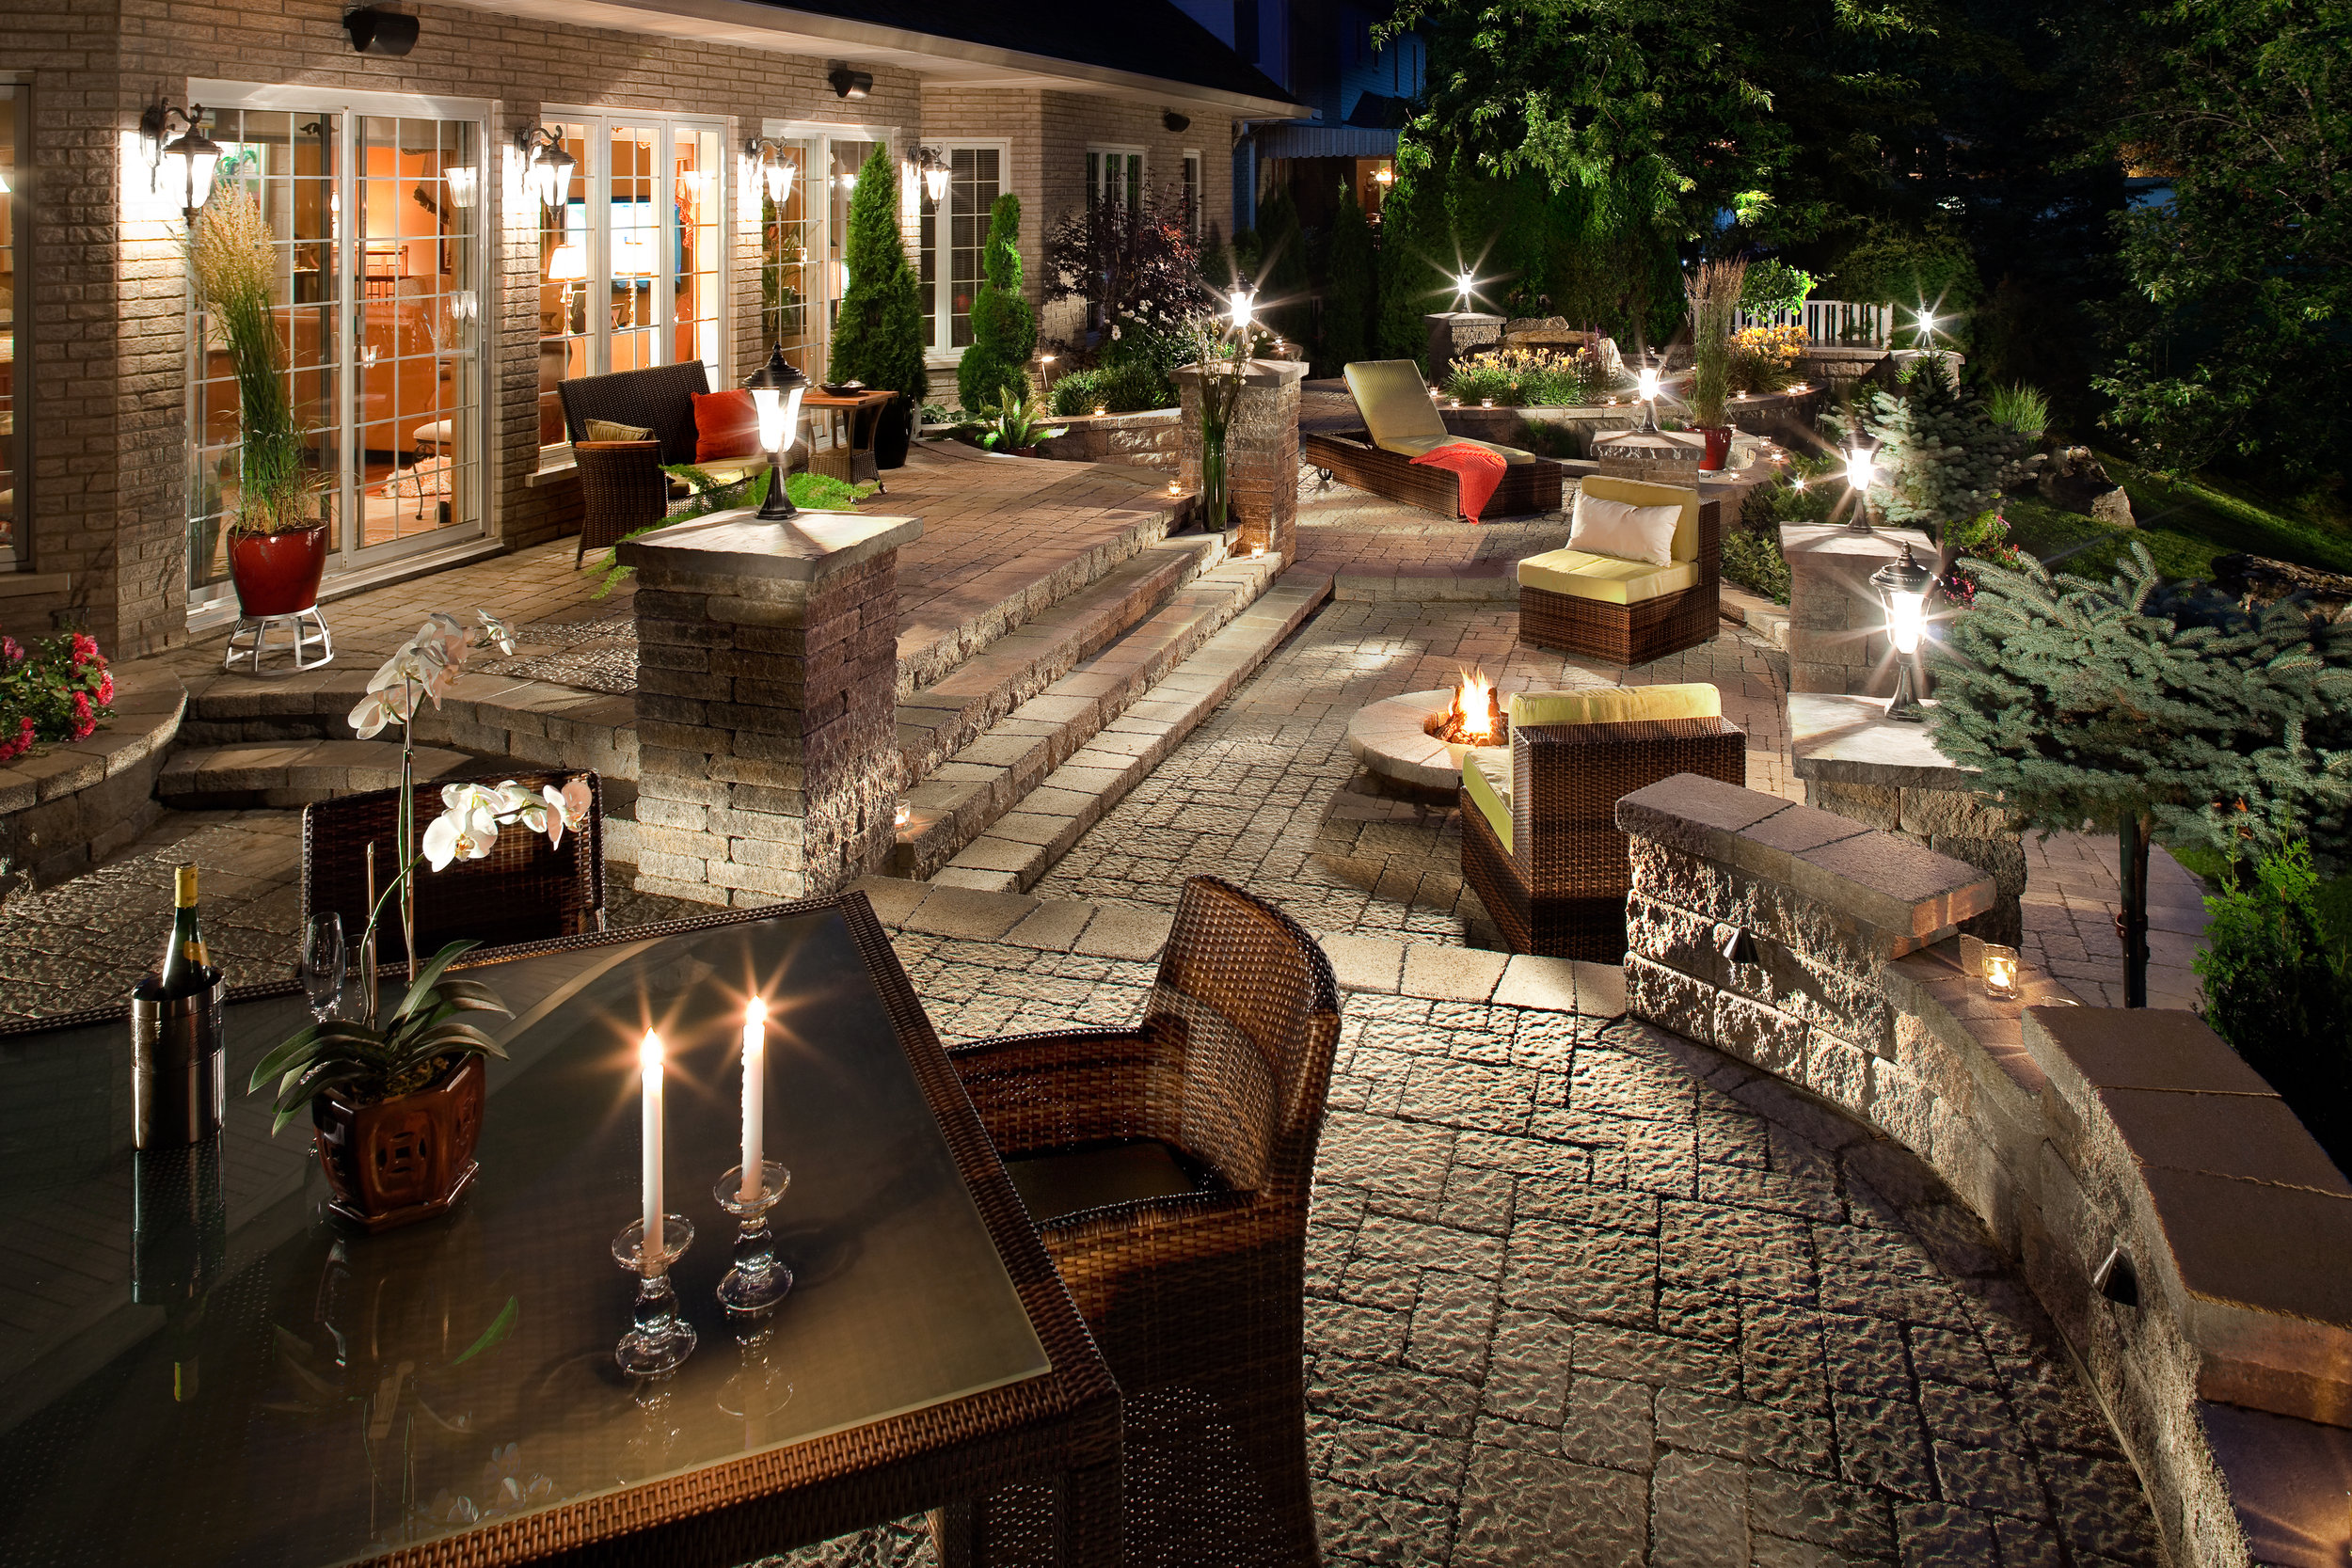 landscape lighting patio design plantings retaining sitting wall.jpg